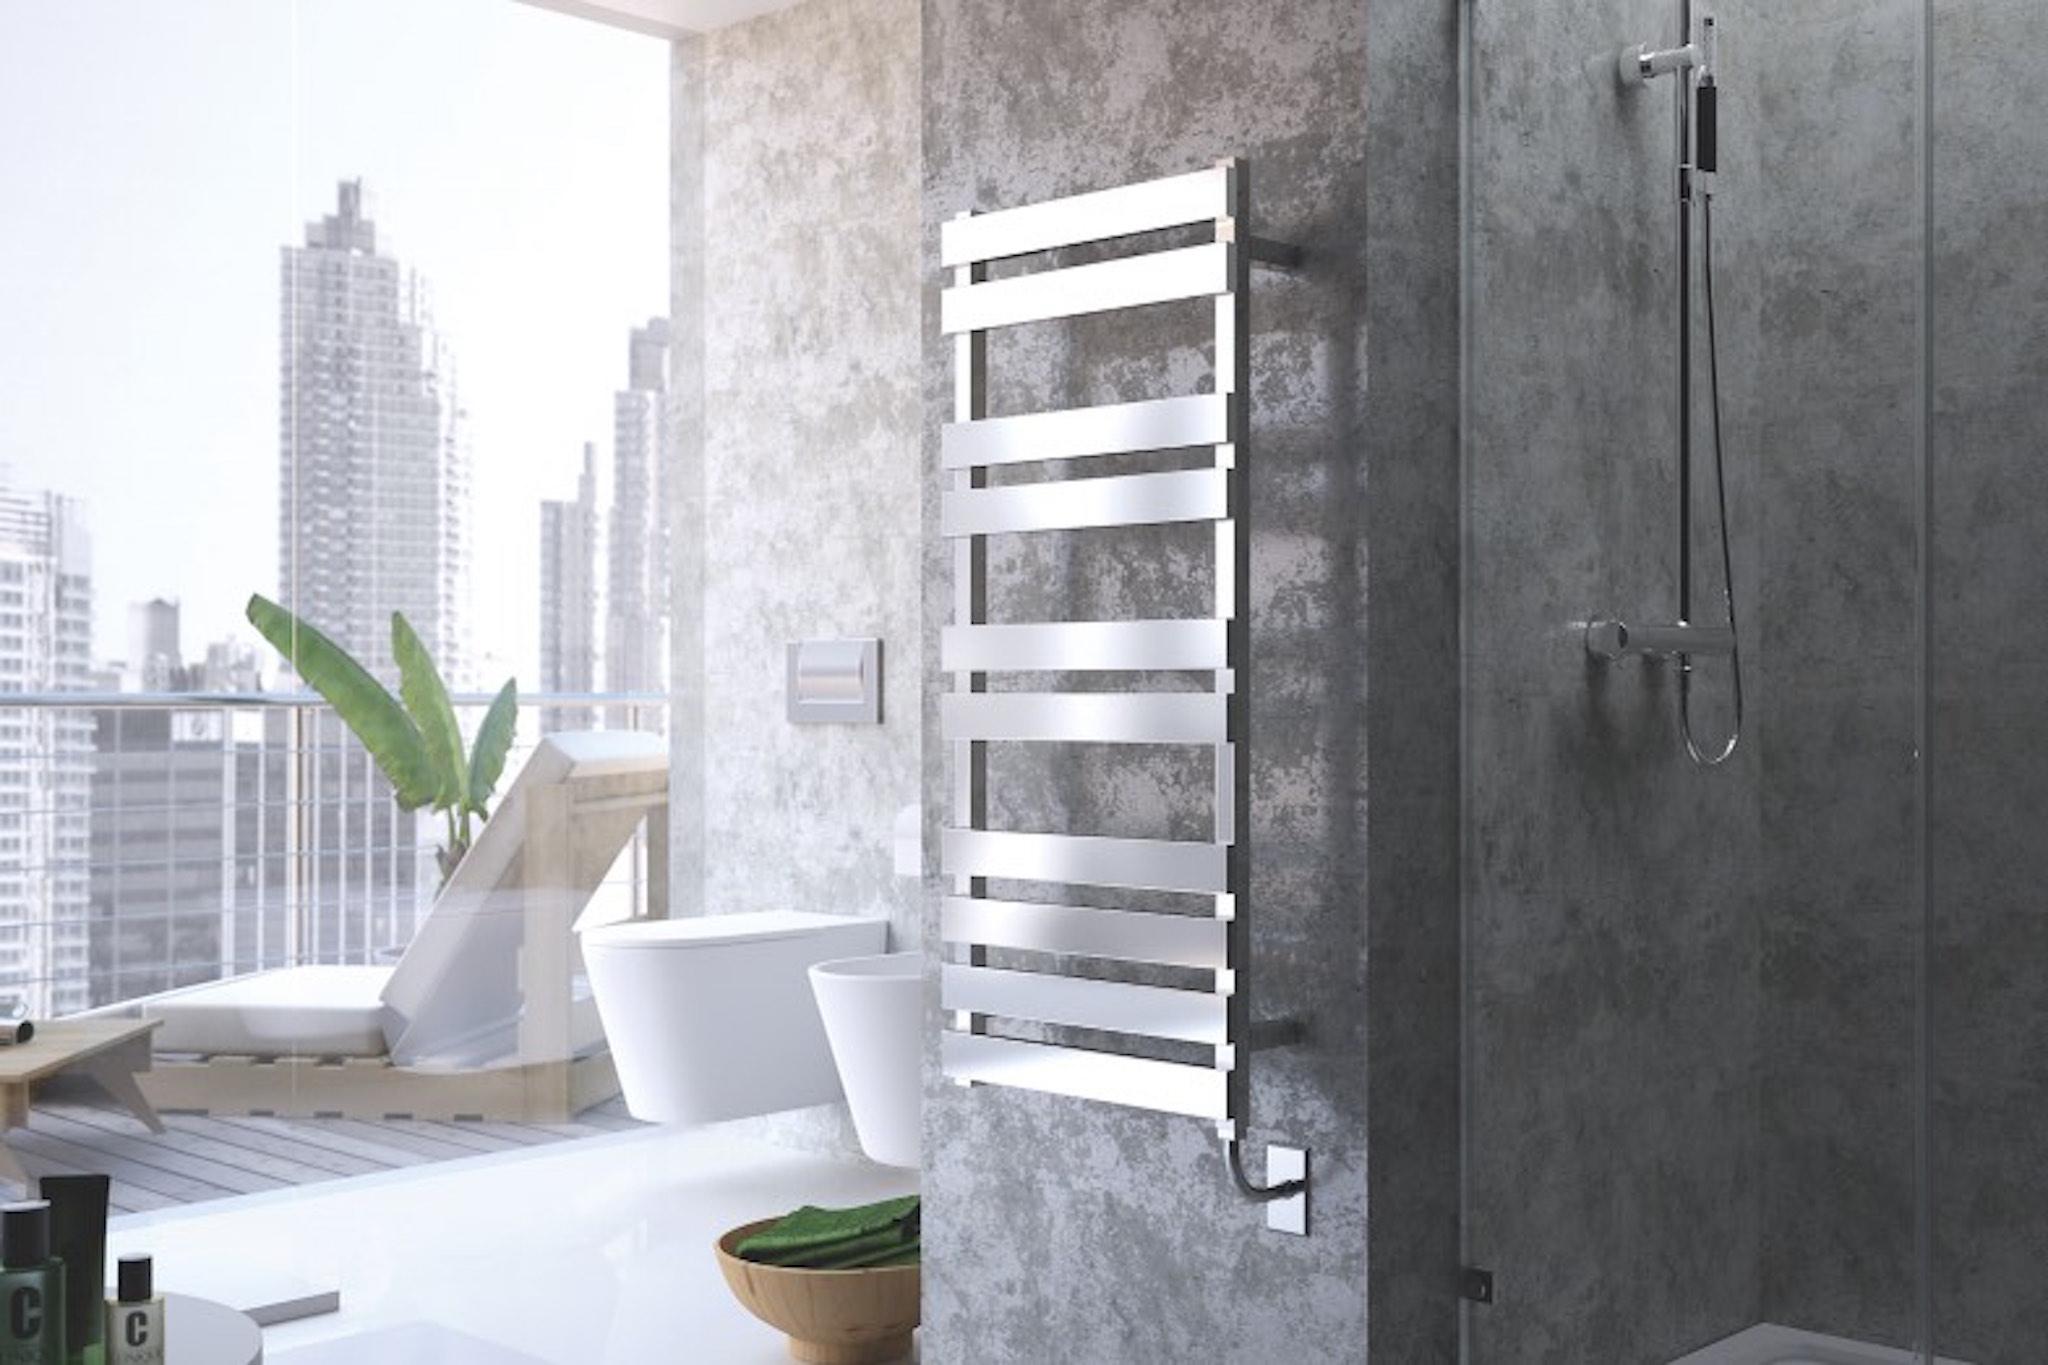 Towel Bar Home Depot | Amba Towel Warmers | Personal Towel Warmer